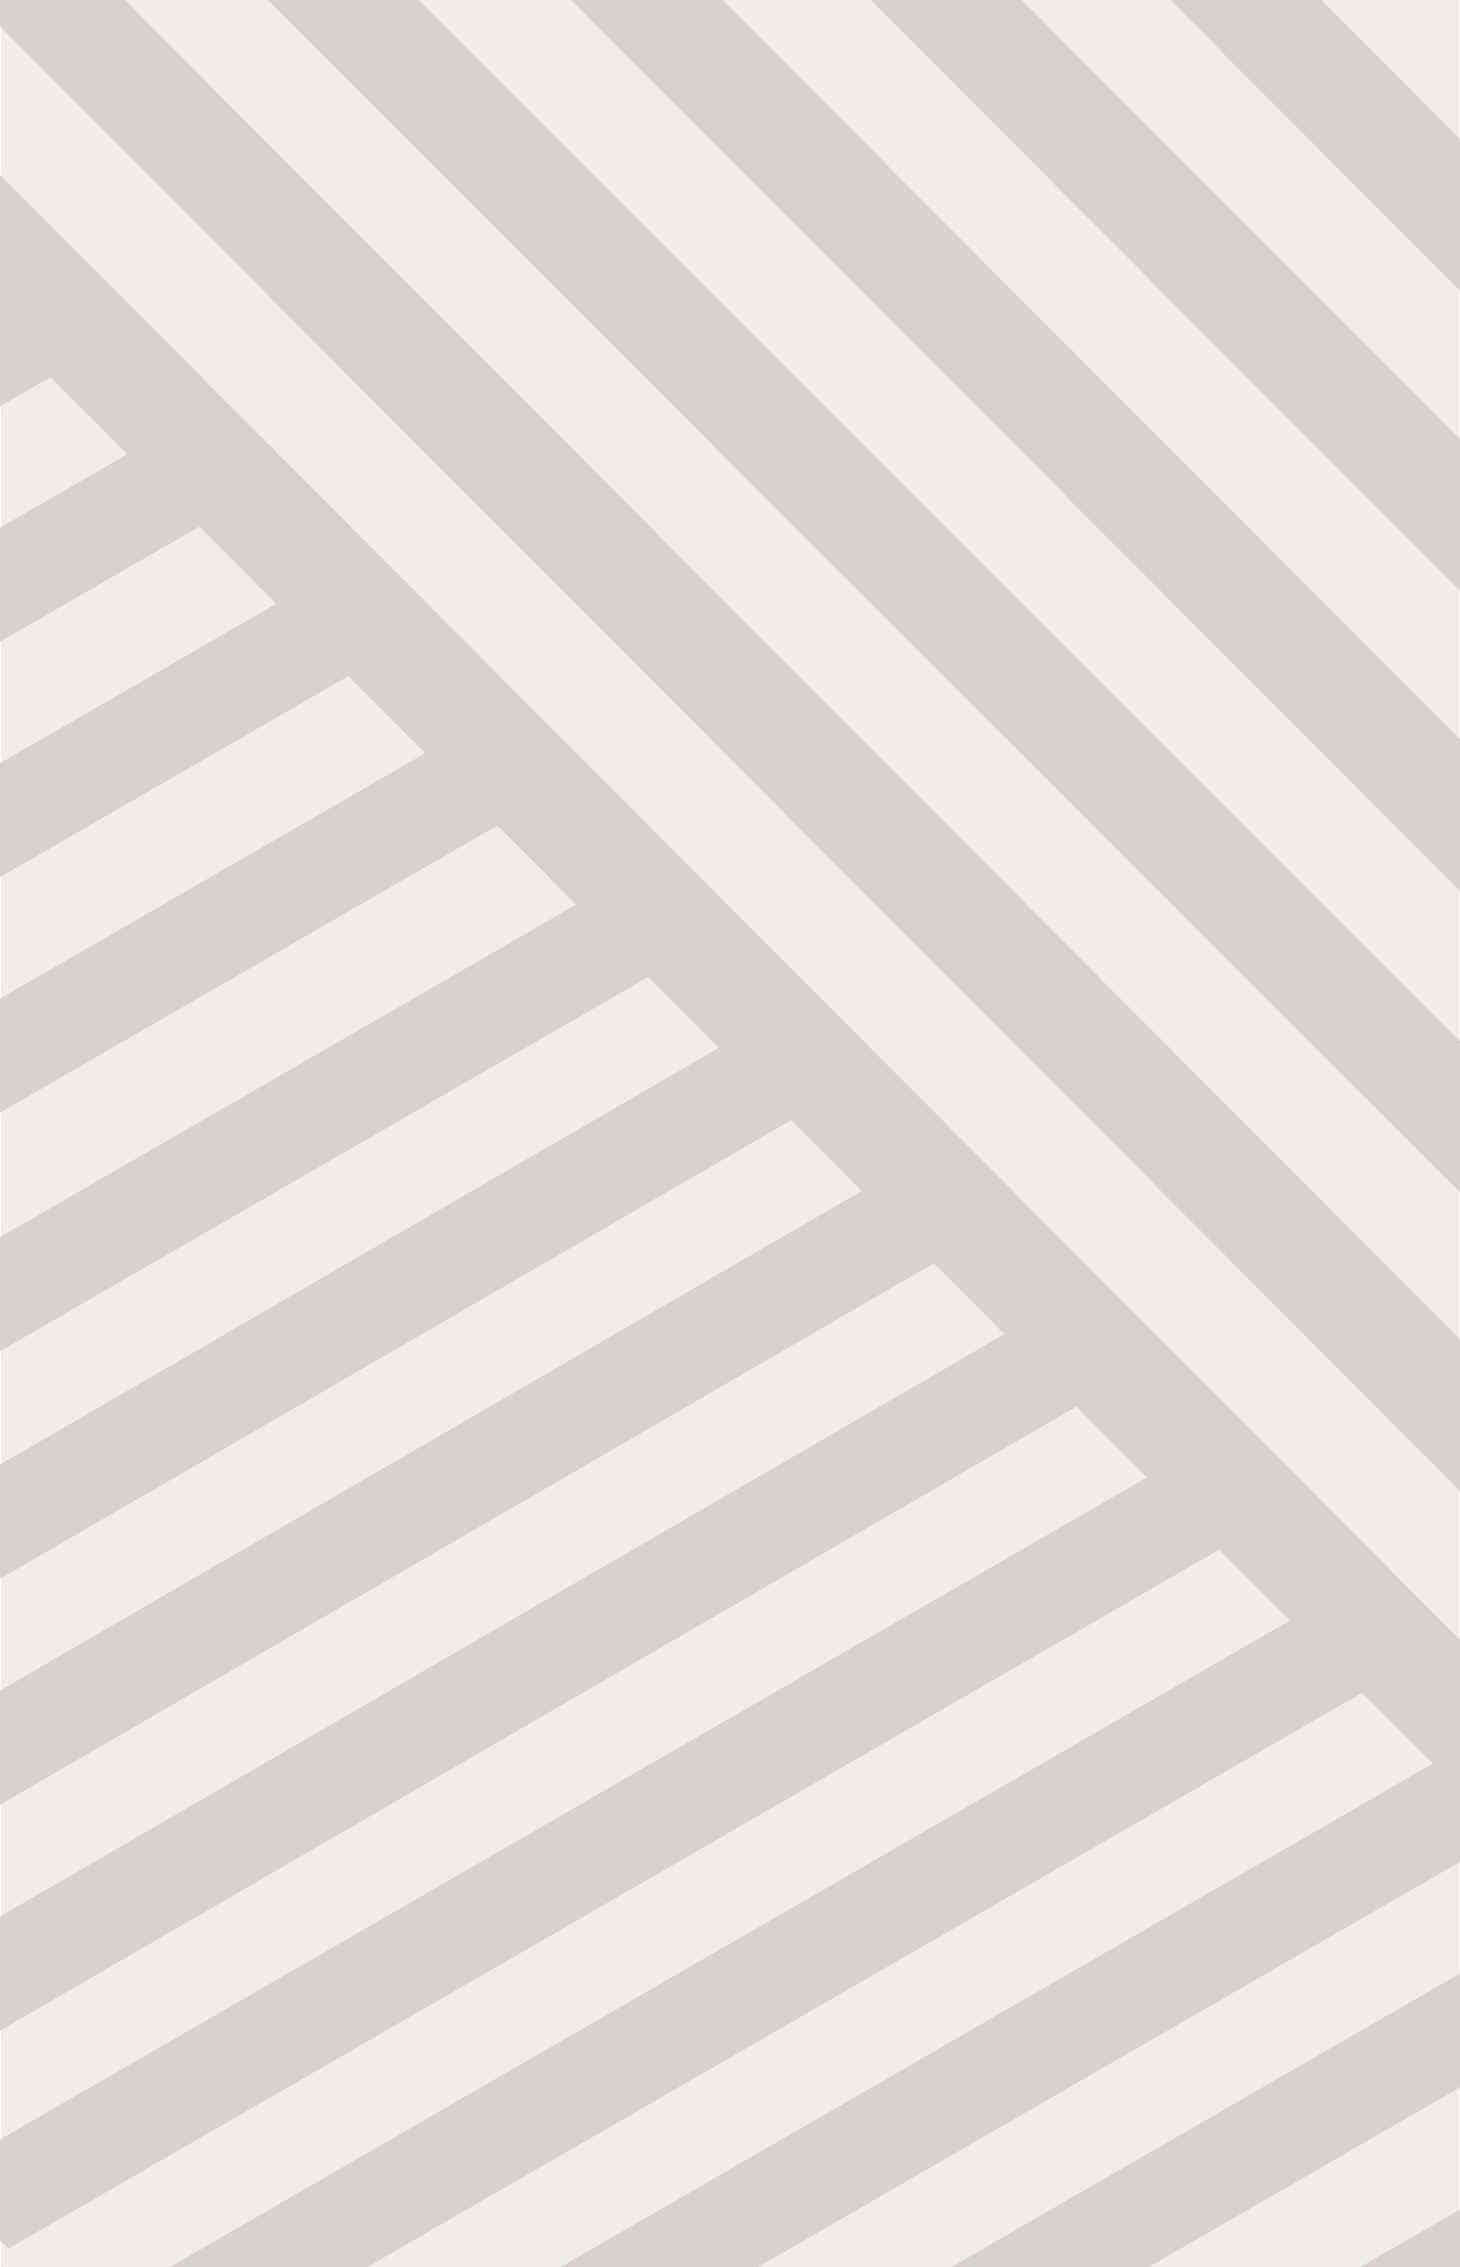 LizGastro_Pattern_01.jpg